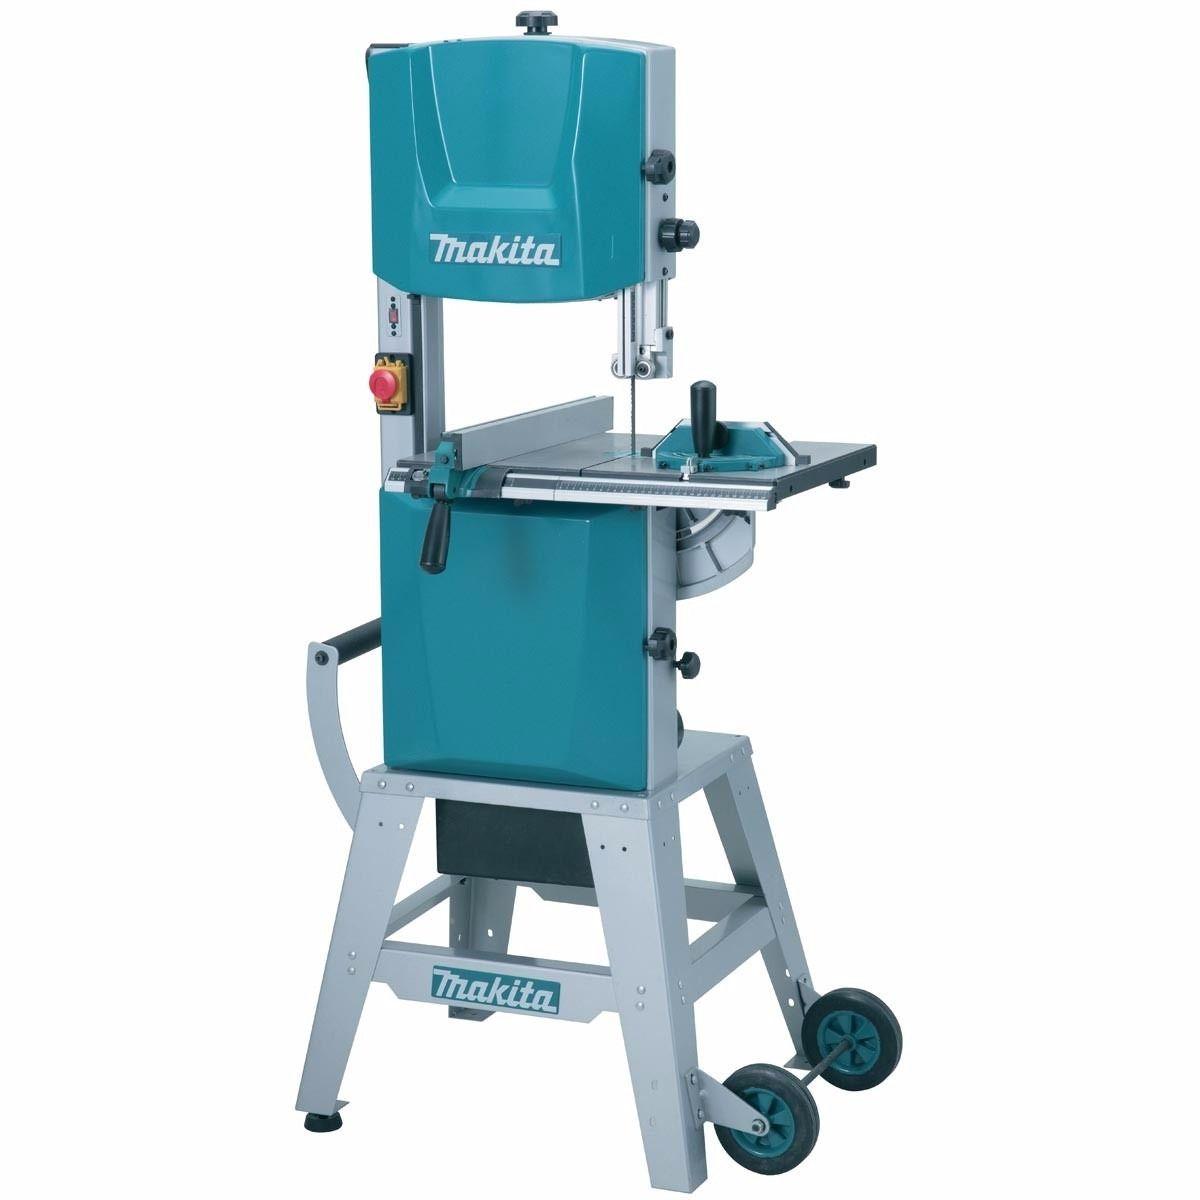 Sierra Sin Fin Makita Lb1200 De 900 W Para Madera Uso Profesional Industria Maquinas Para Carpinteria Herramientas Makita Herramientas Manuales De Carpintería